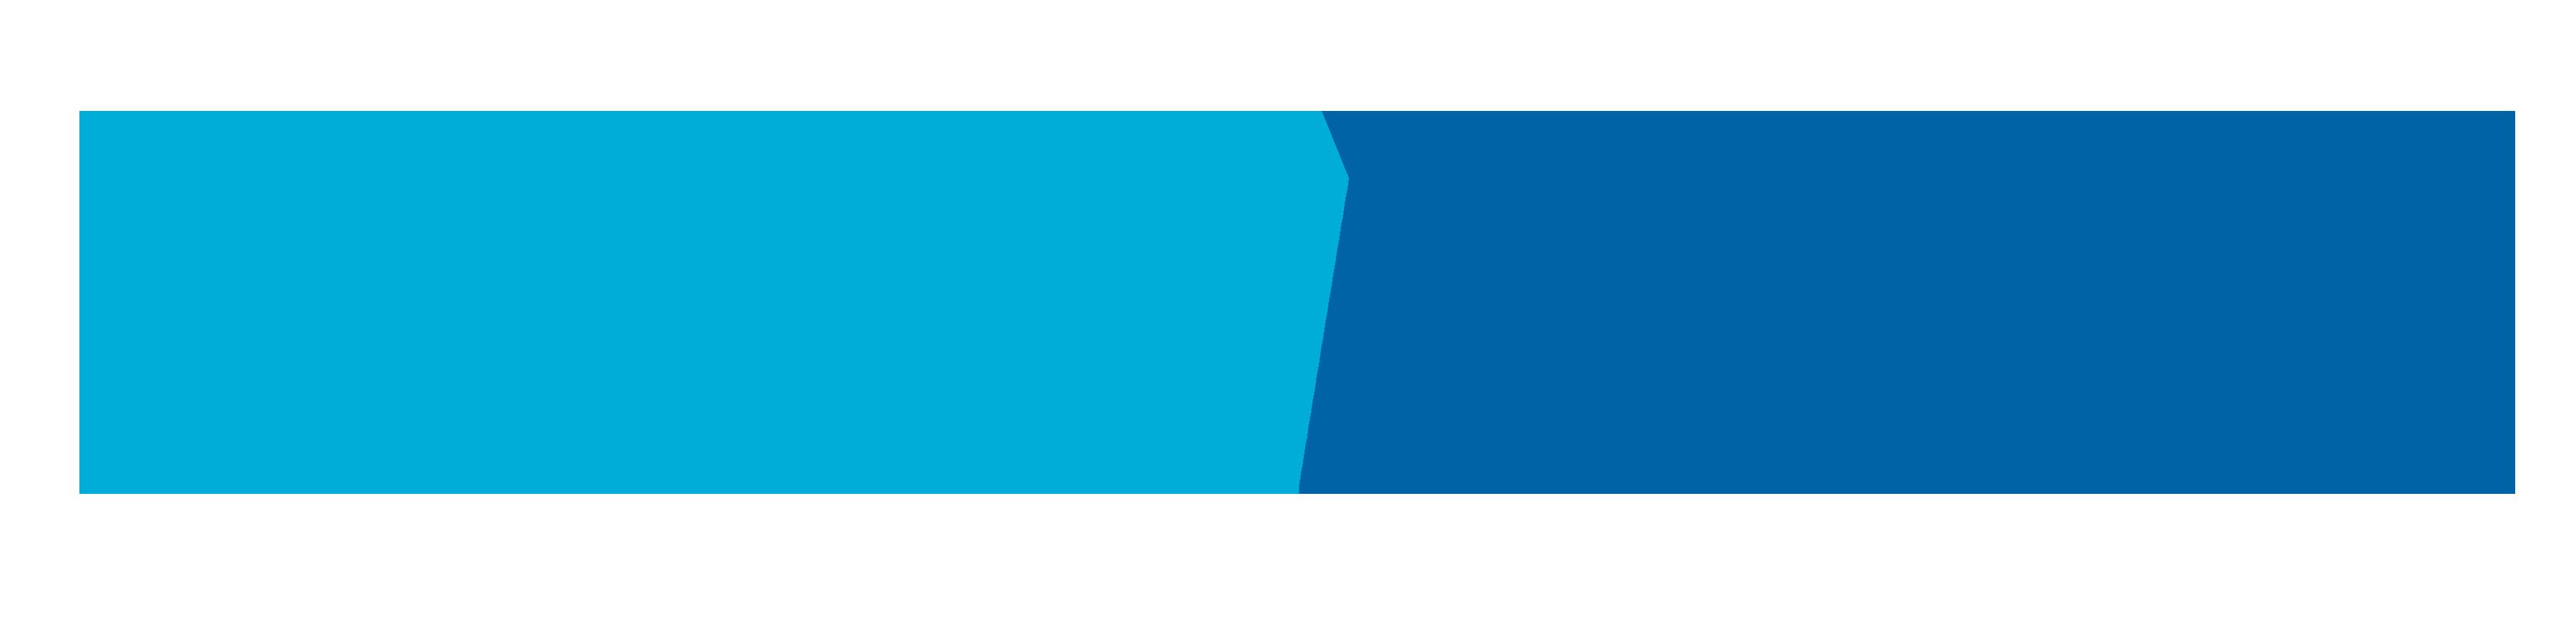 formfast-logo-2017-print